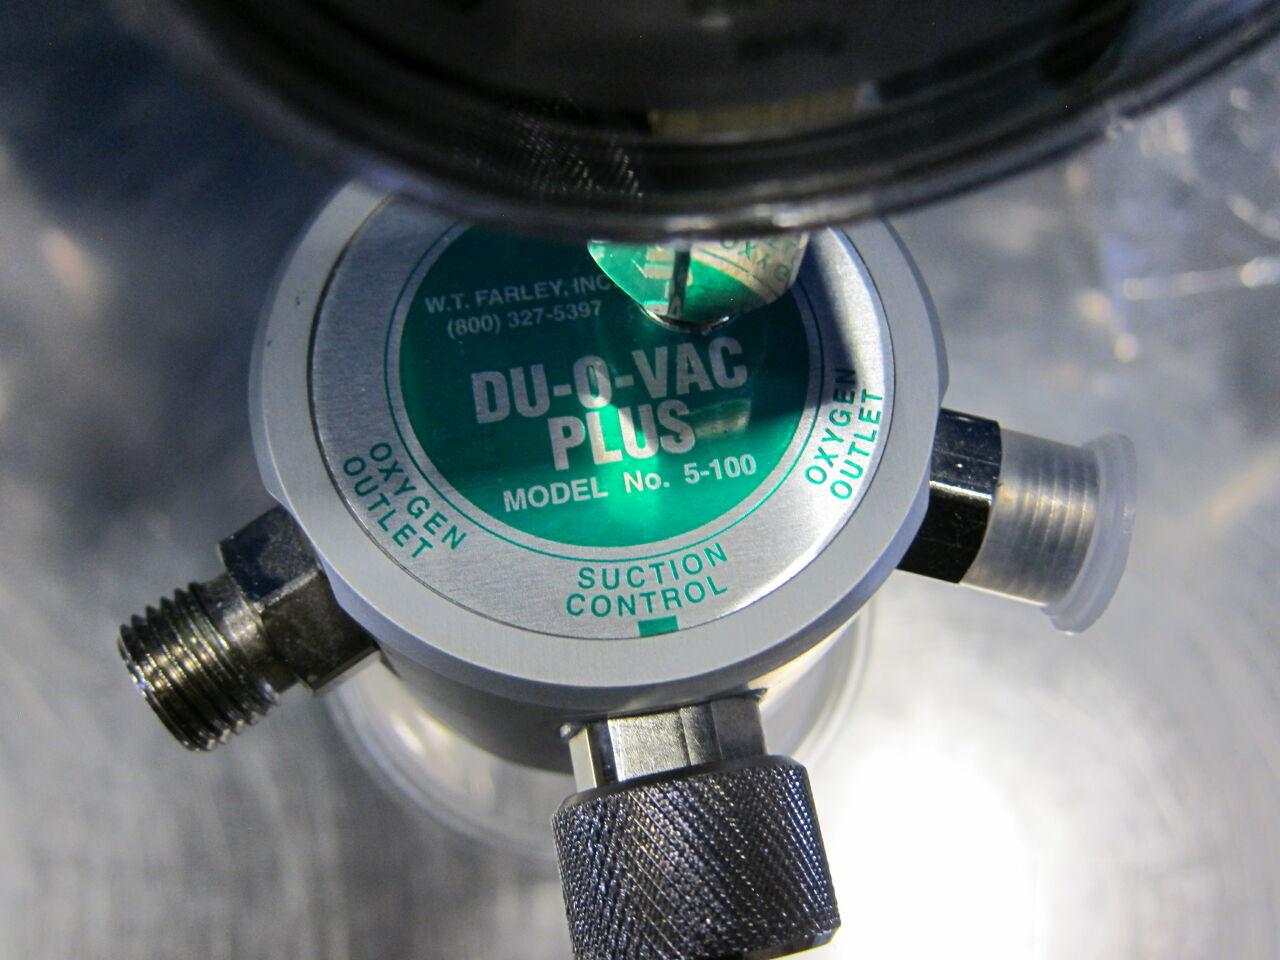 WT FARLEY INC Duo Vac Plus Vacuum Equipment